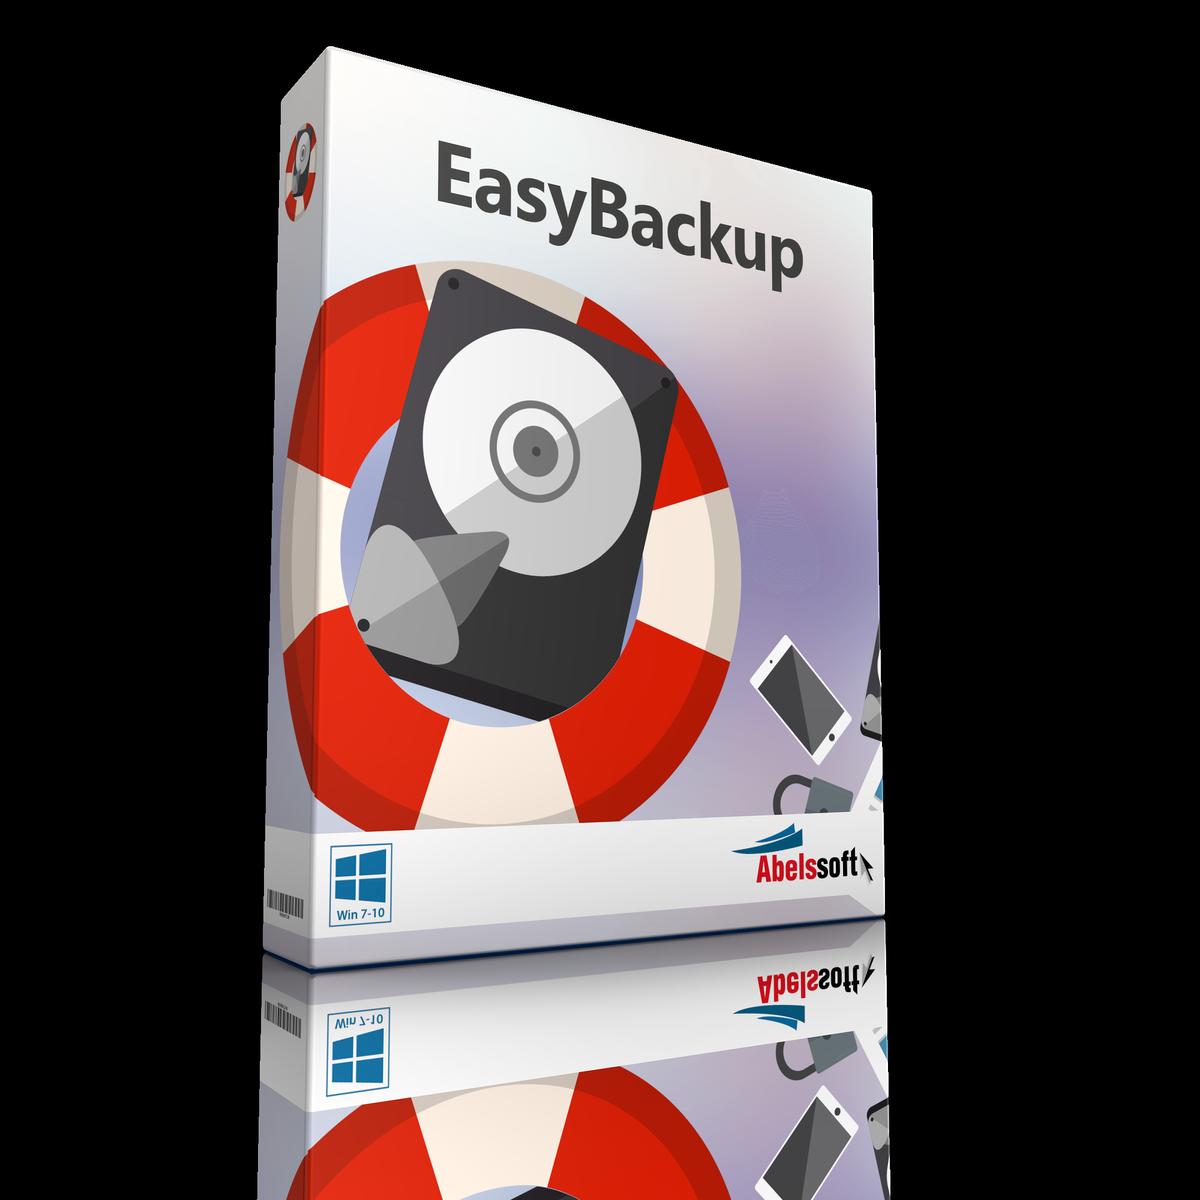 APC full-version software downloads | TechRadar